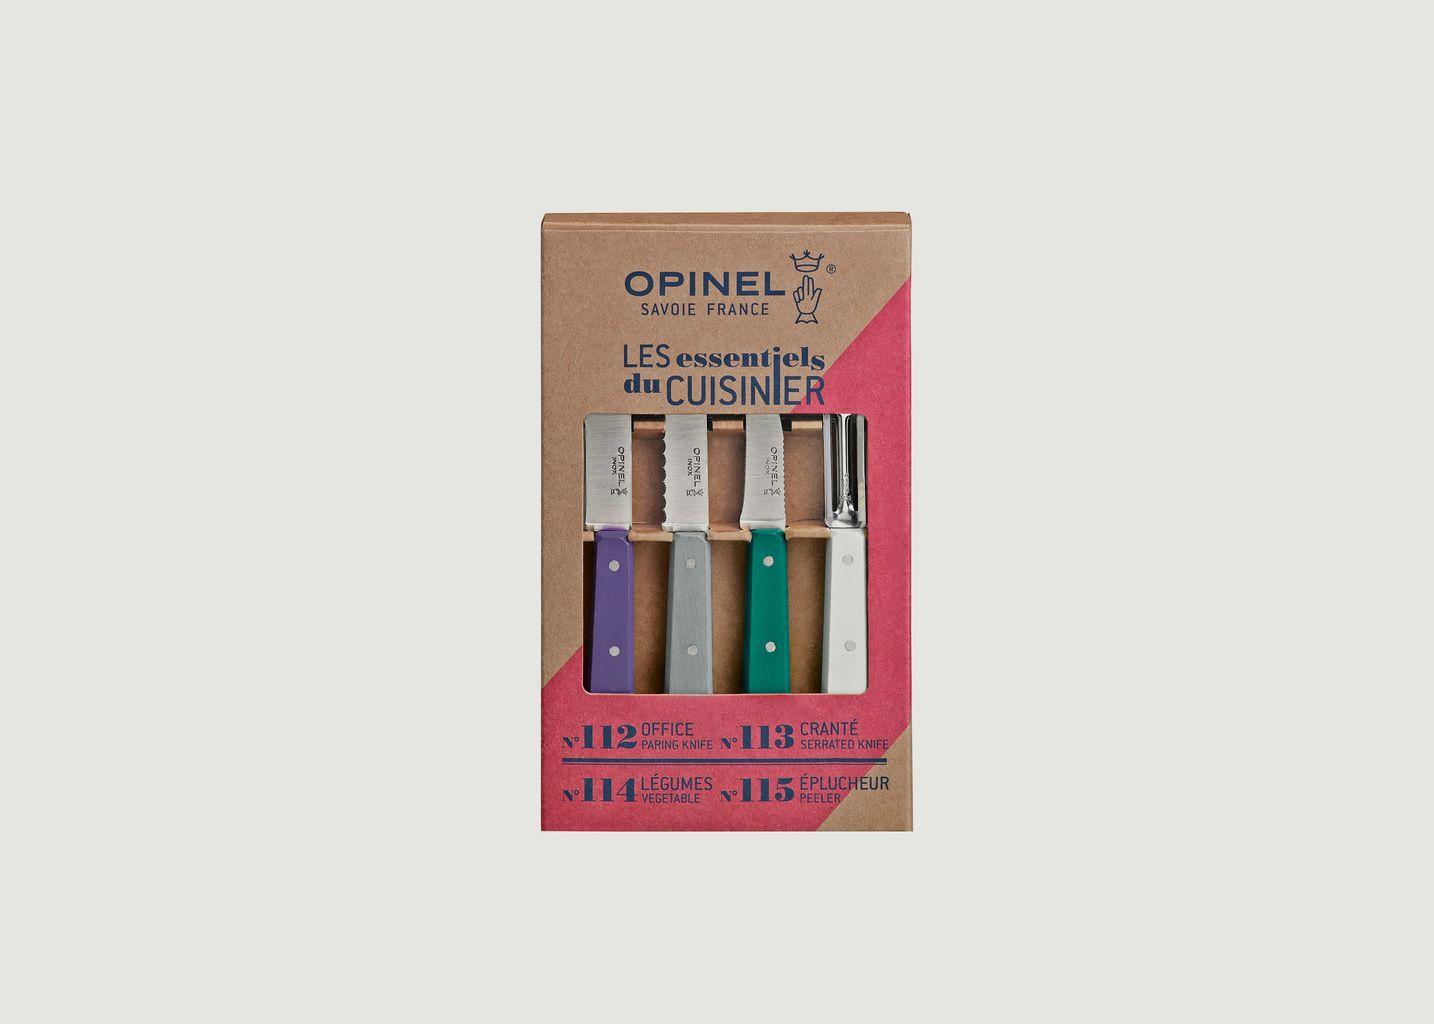 Coffret Les Essentiels Art Deco - Opinel